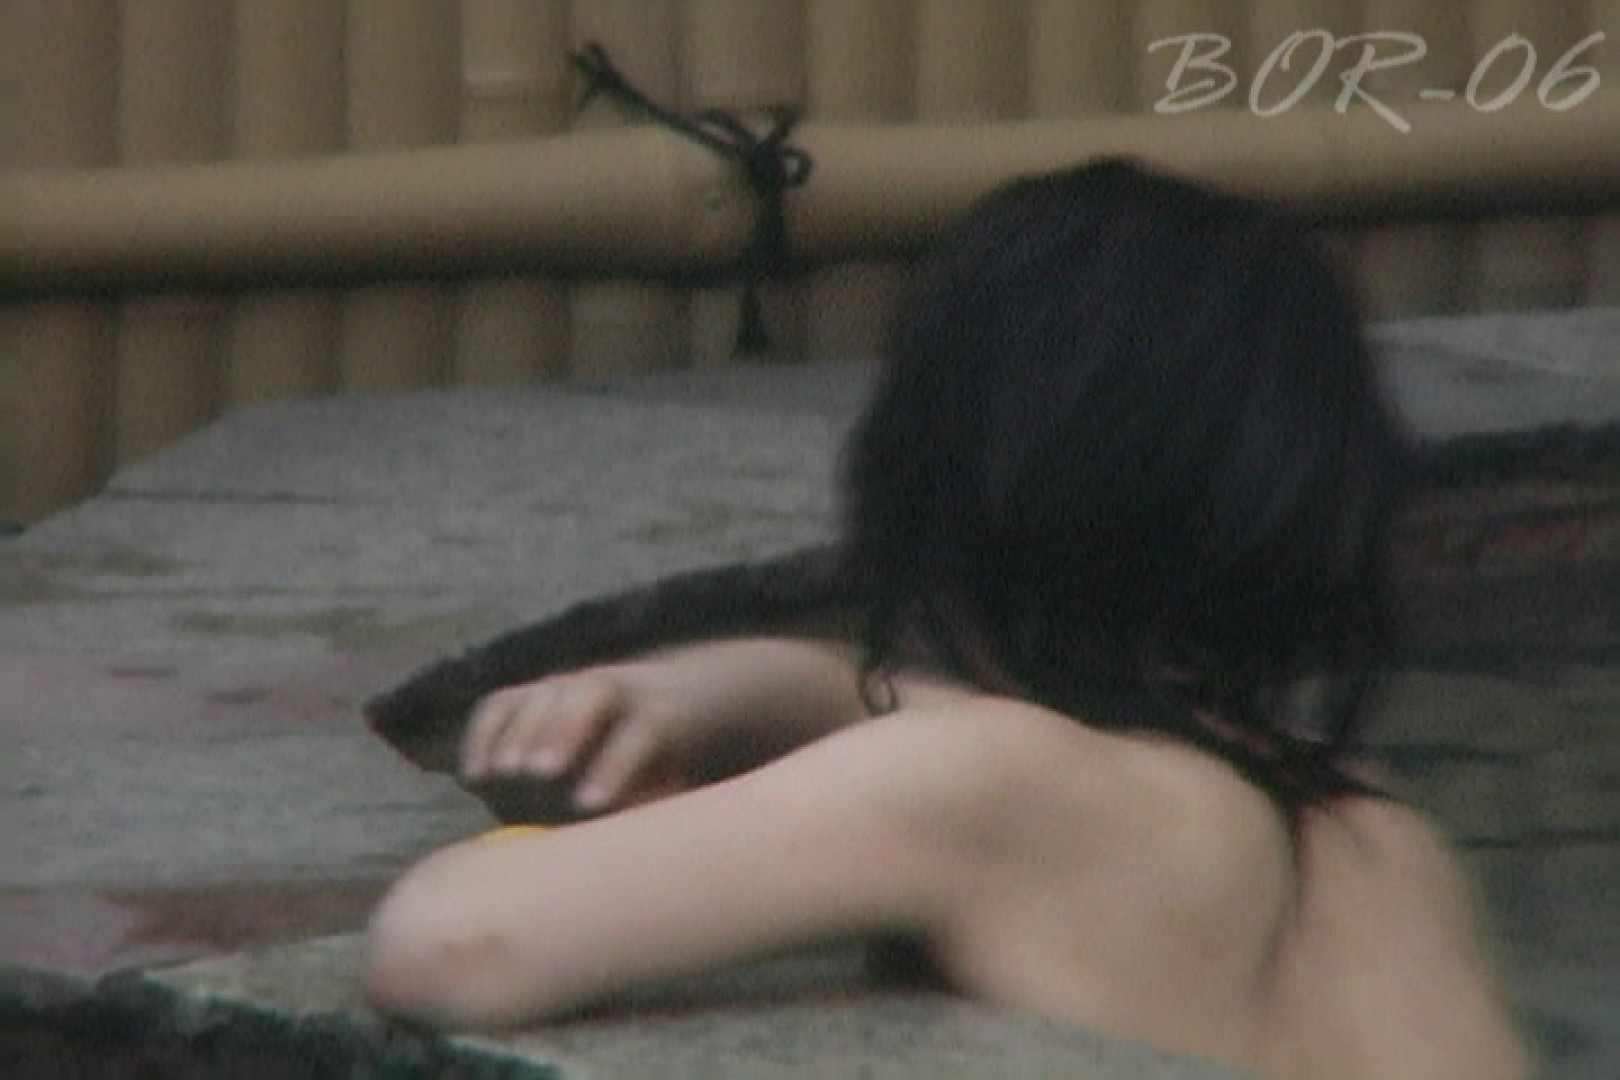 Aquaな露天風呂Vol.520 盗撮シリーズ   露天風呂編  110PIX 19